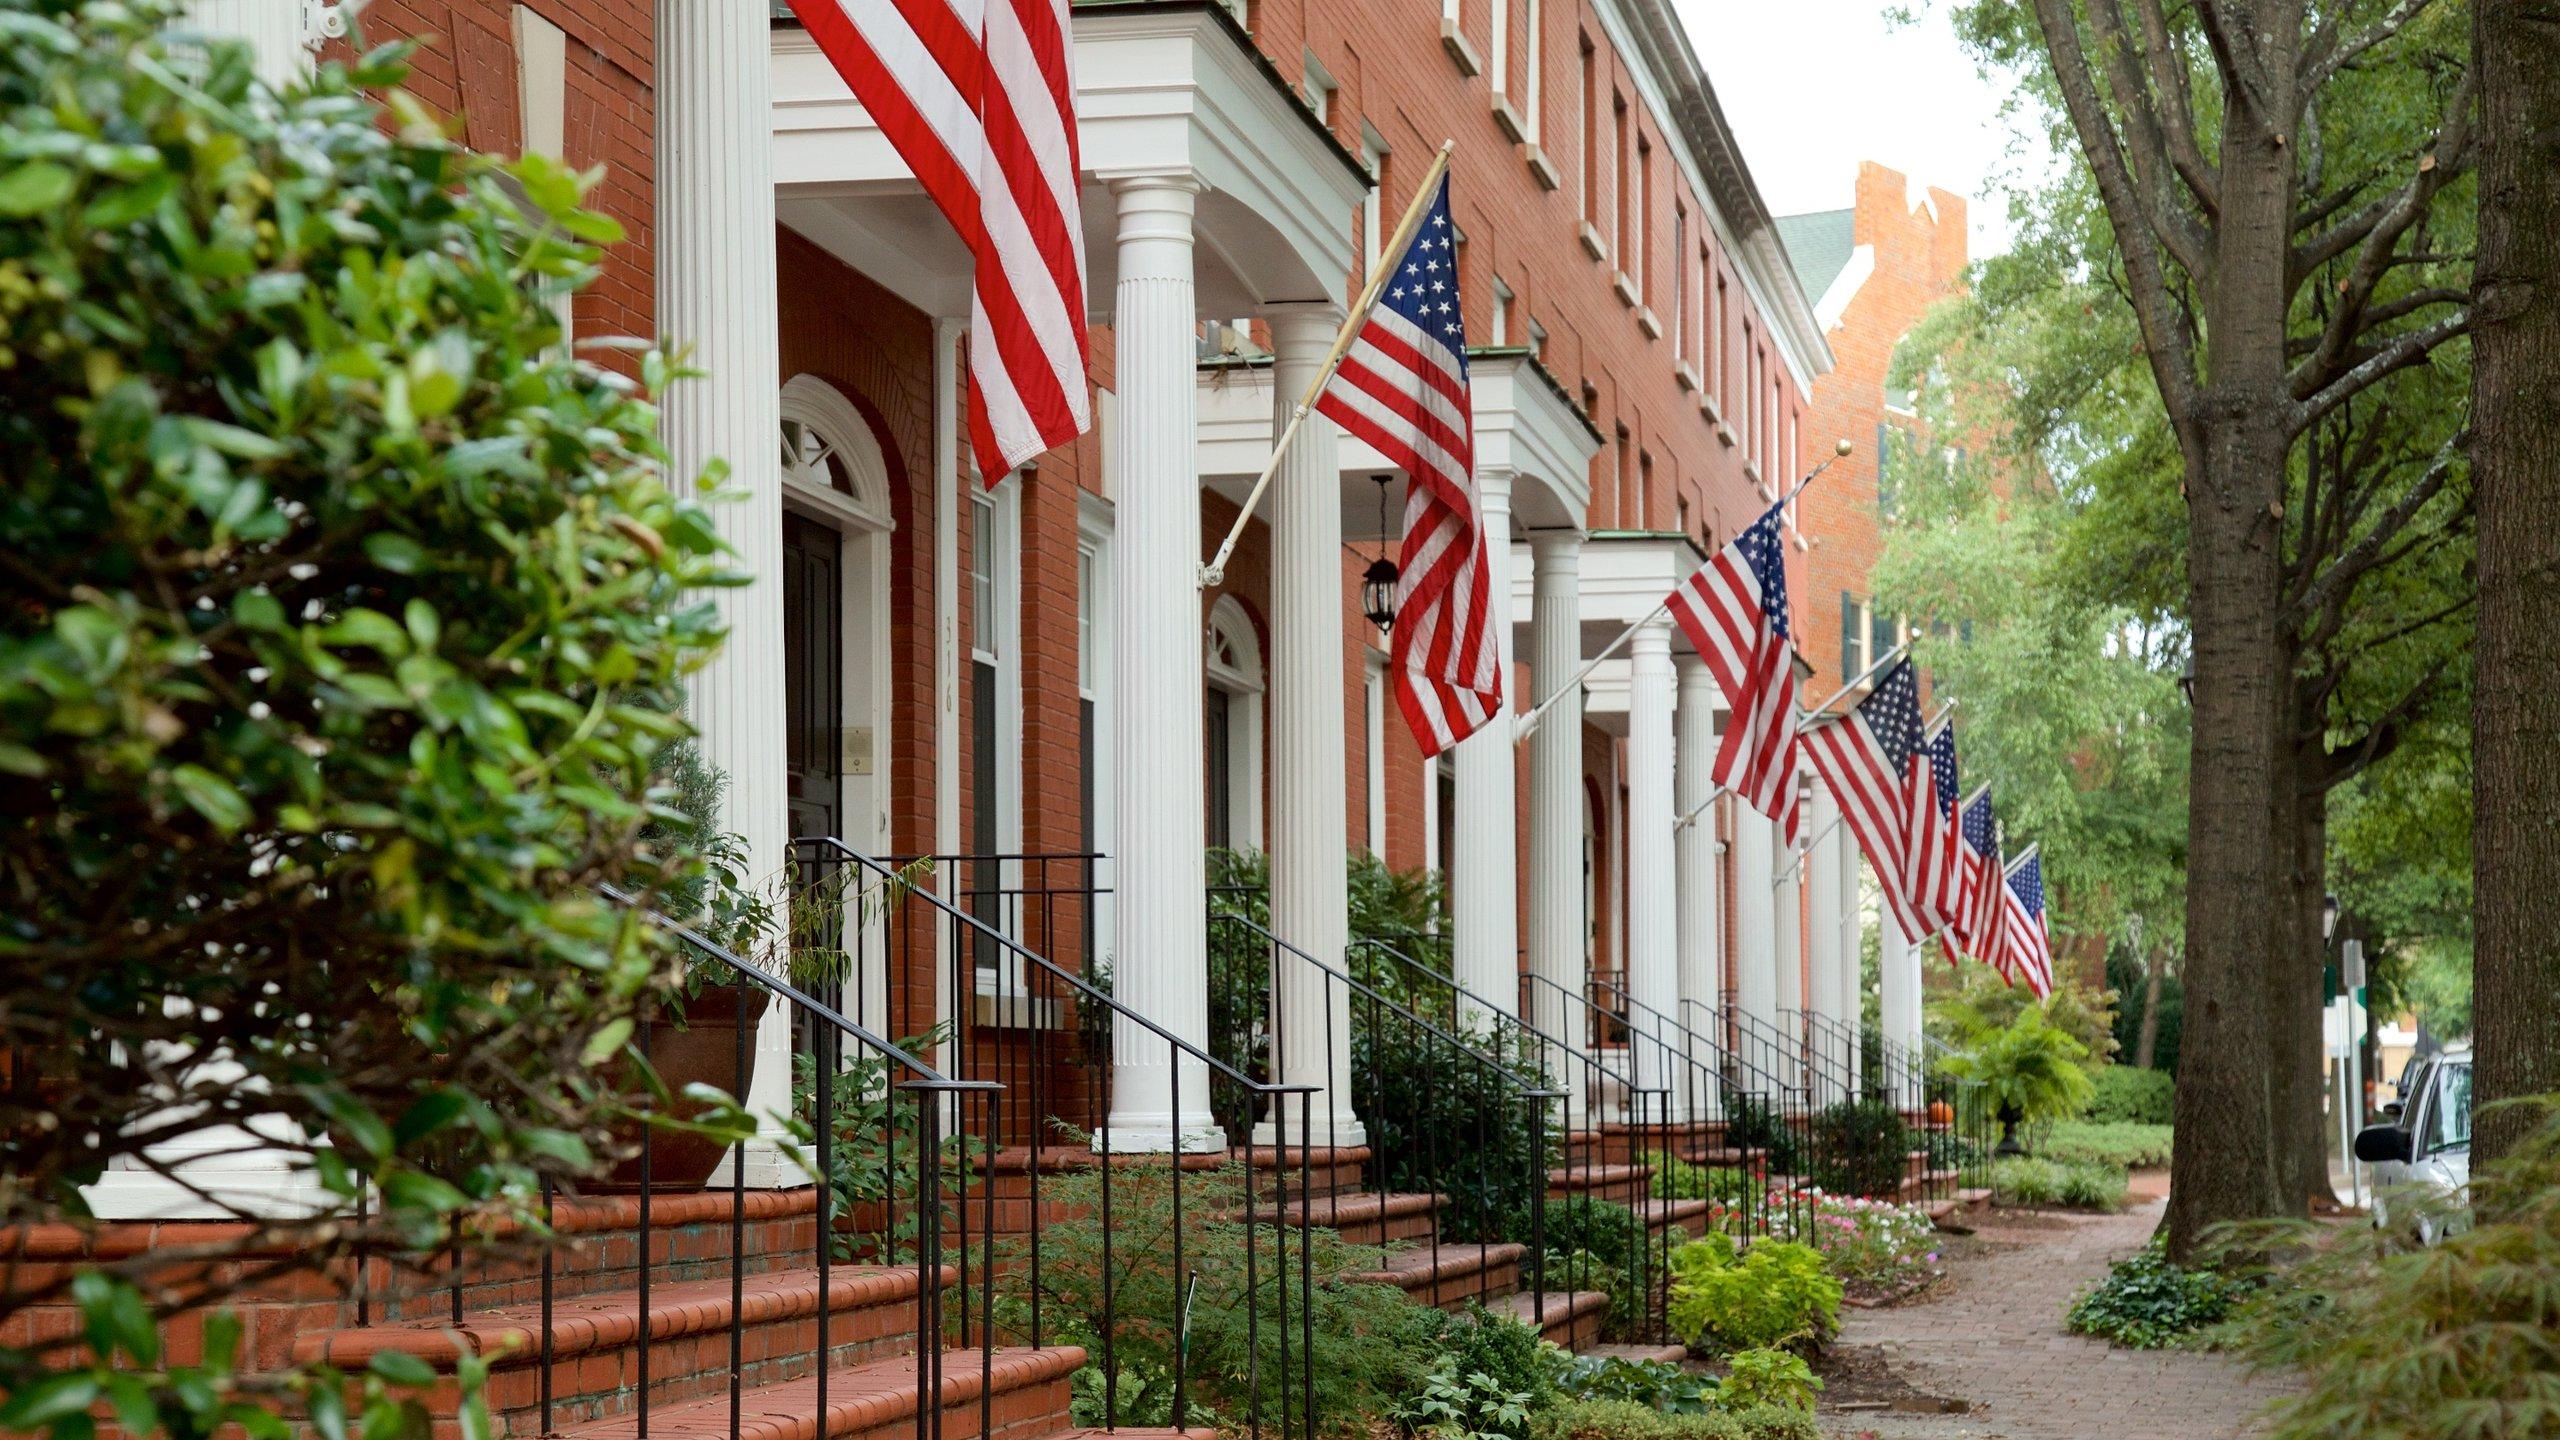 Norfolk City County, Virginia, United States of America